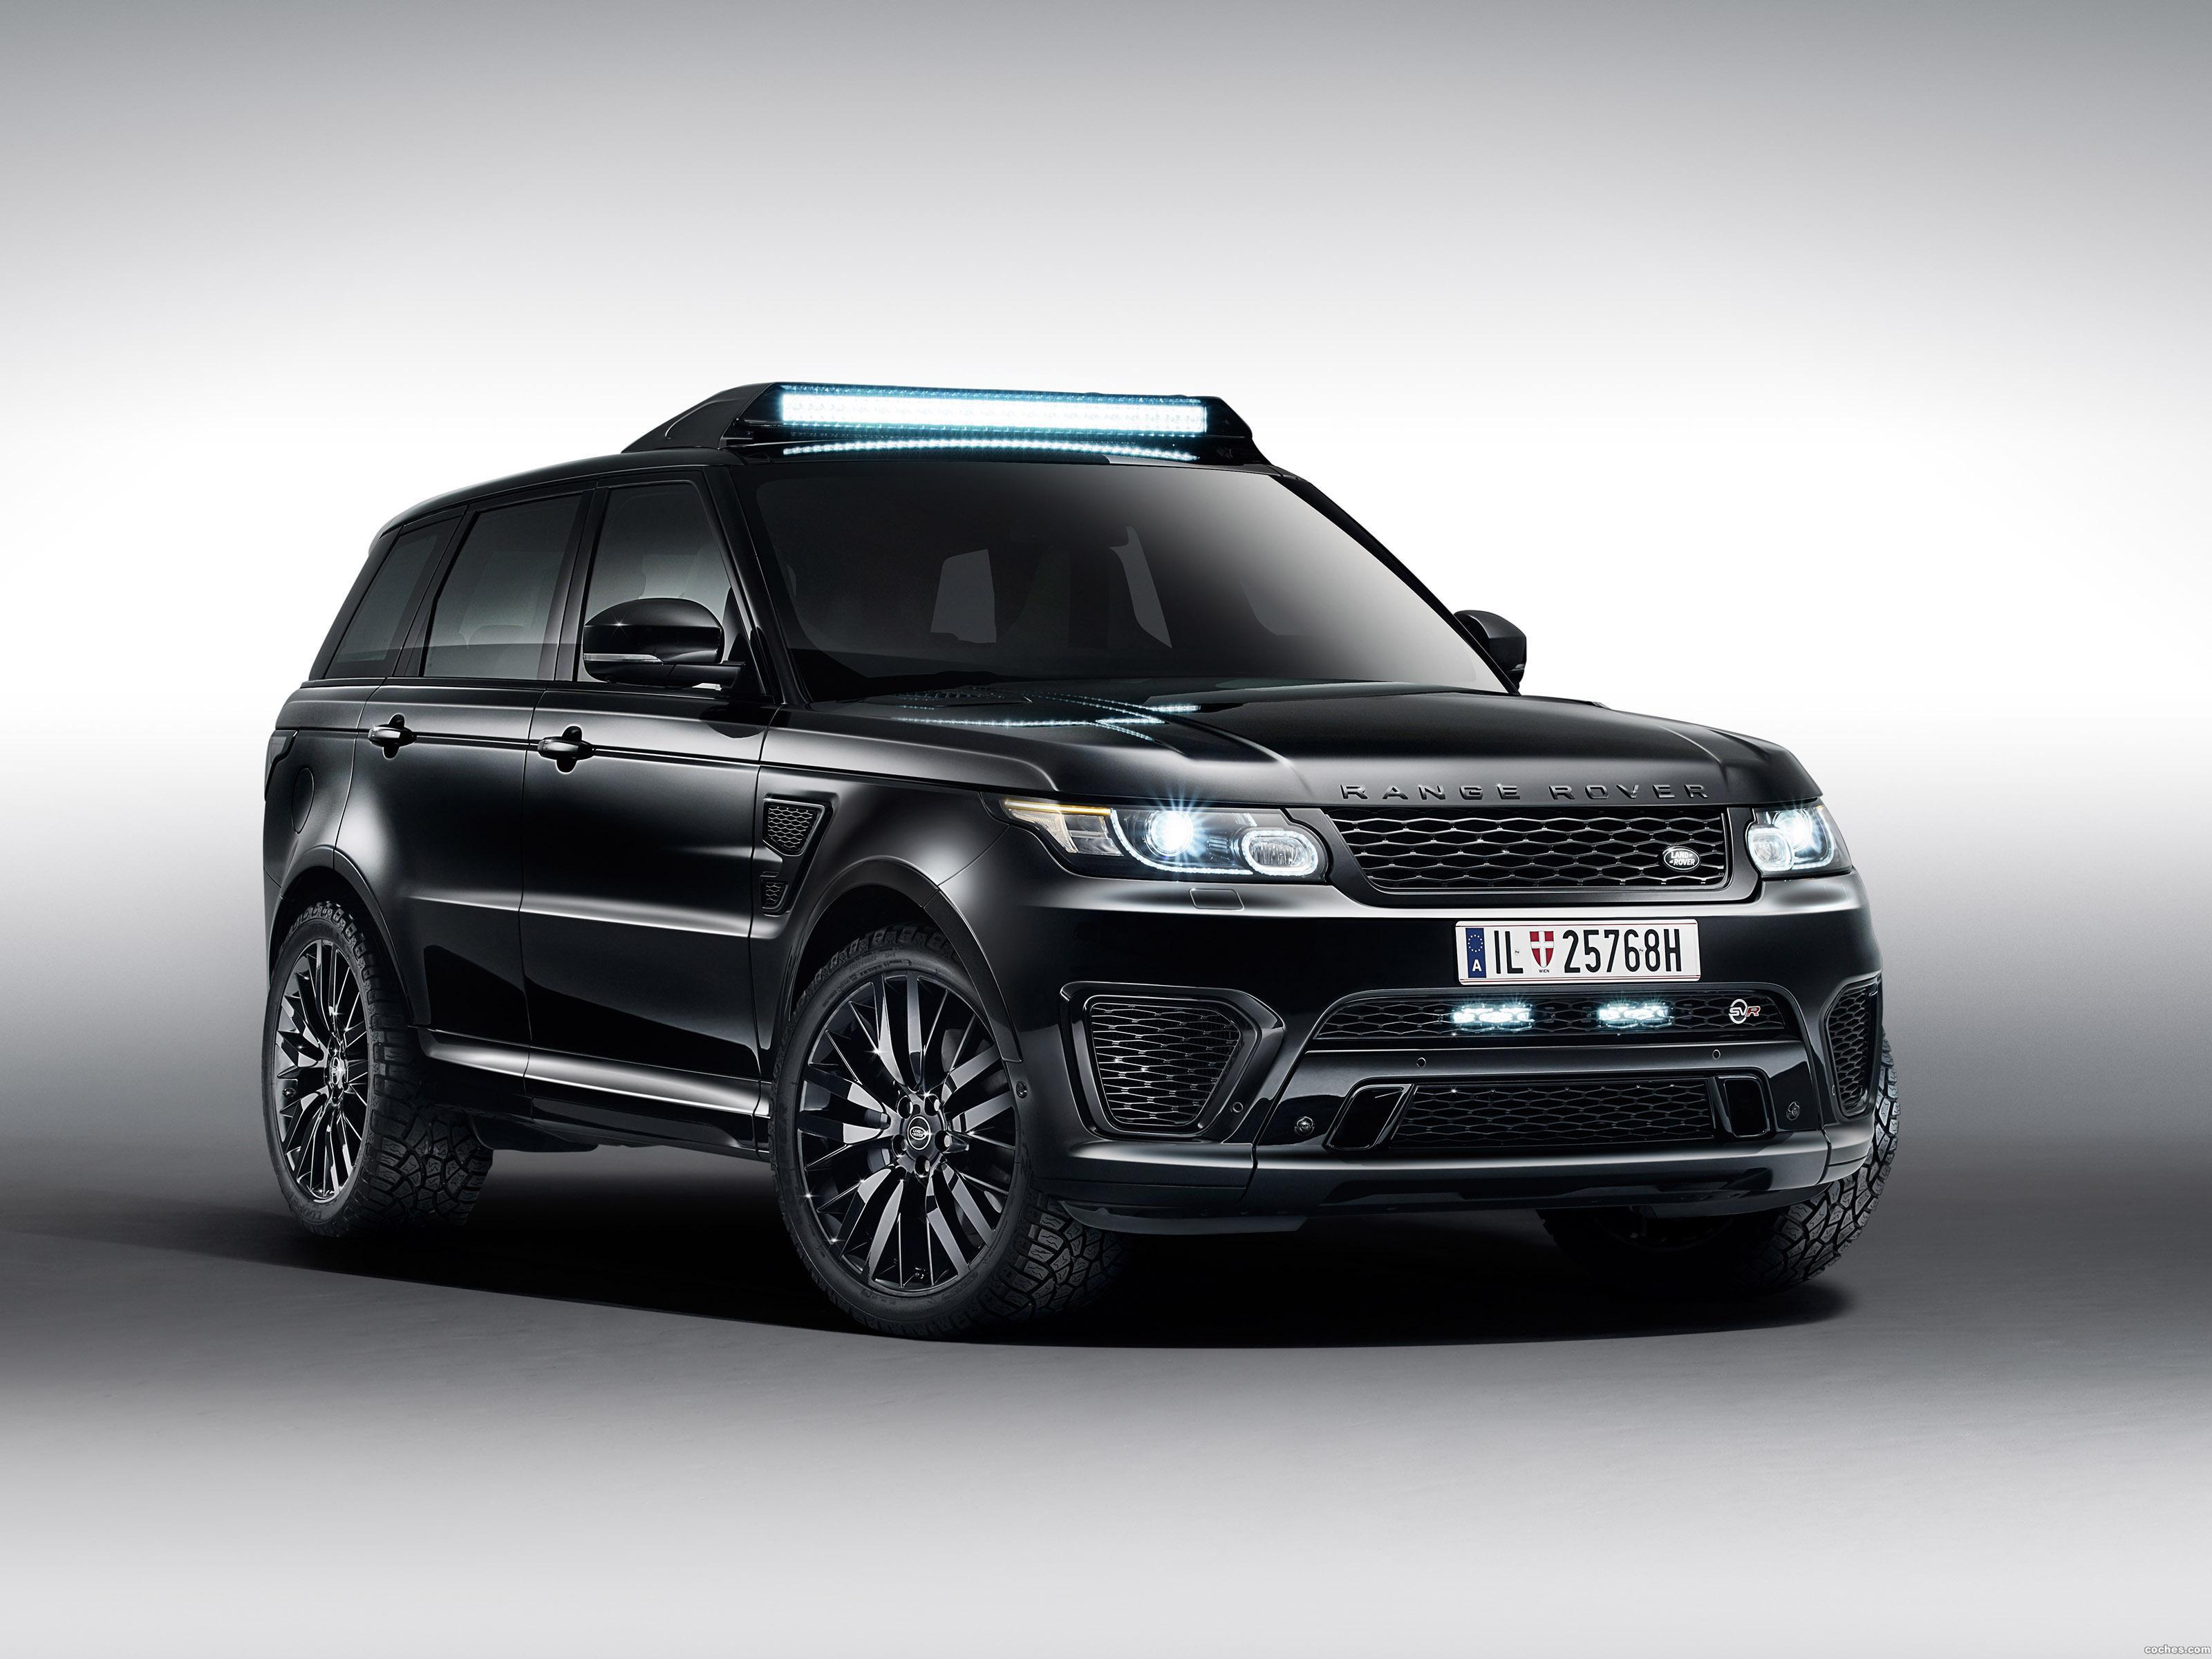 Foto 0 de Land Rover Range Rover Sport SVR 007 Spectre 2015